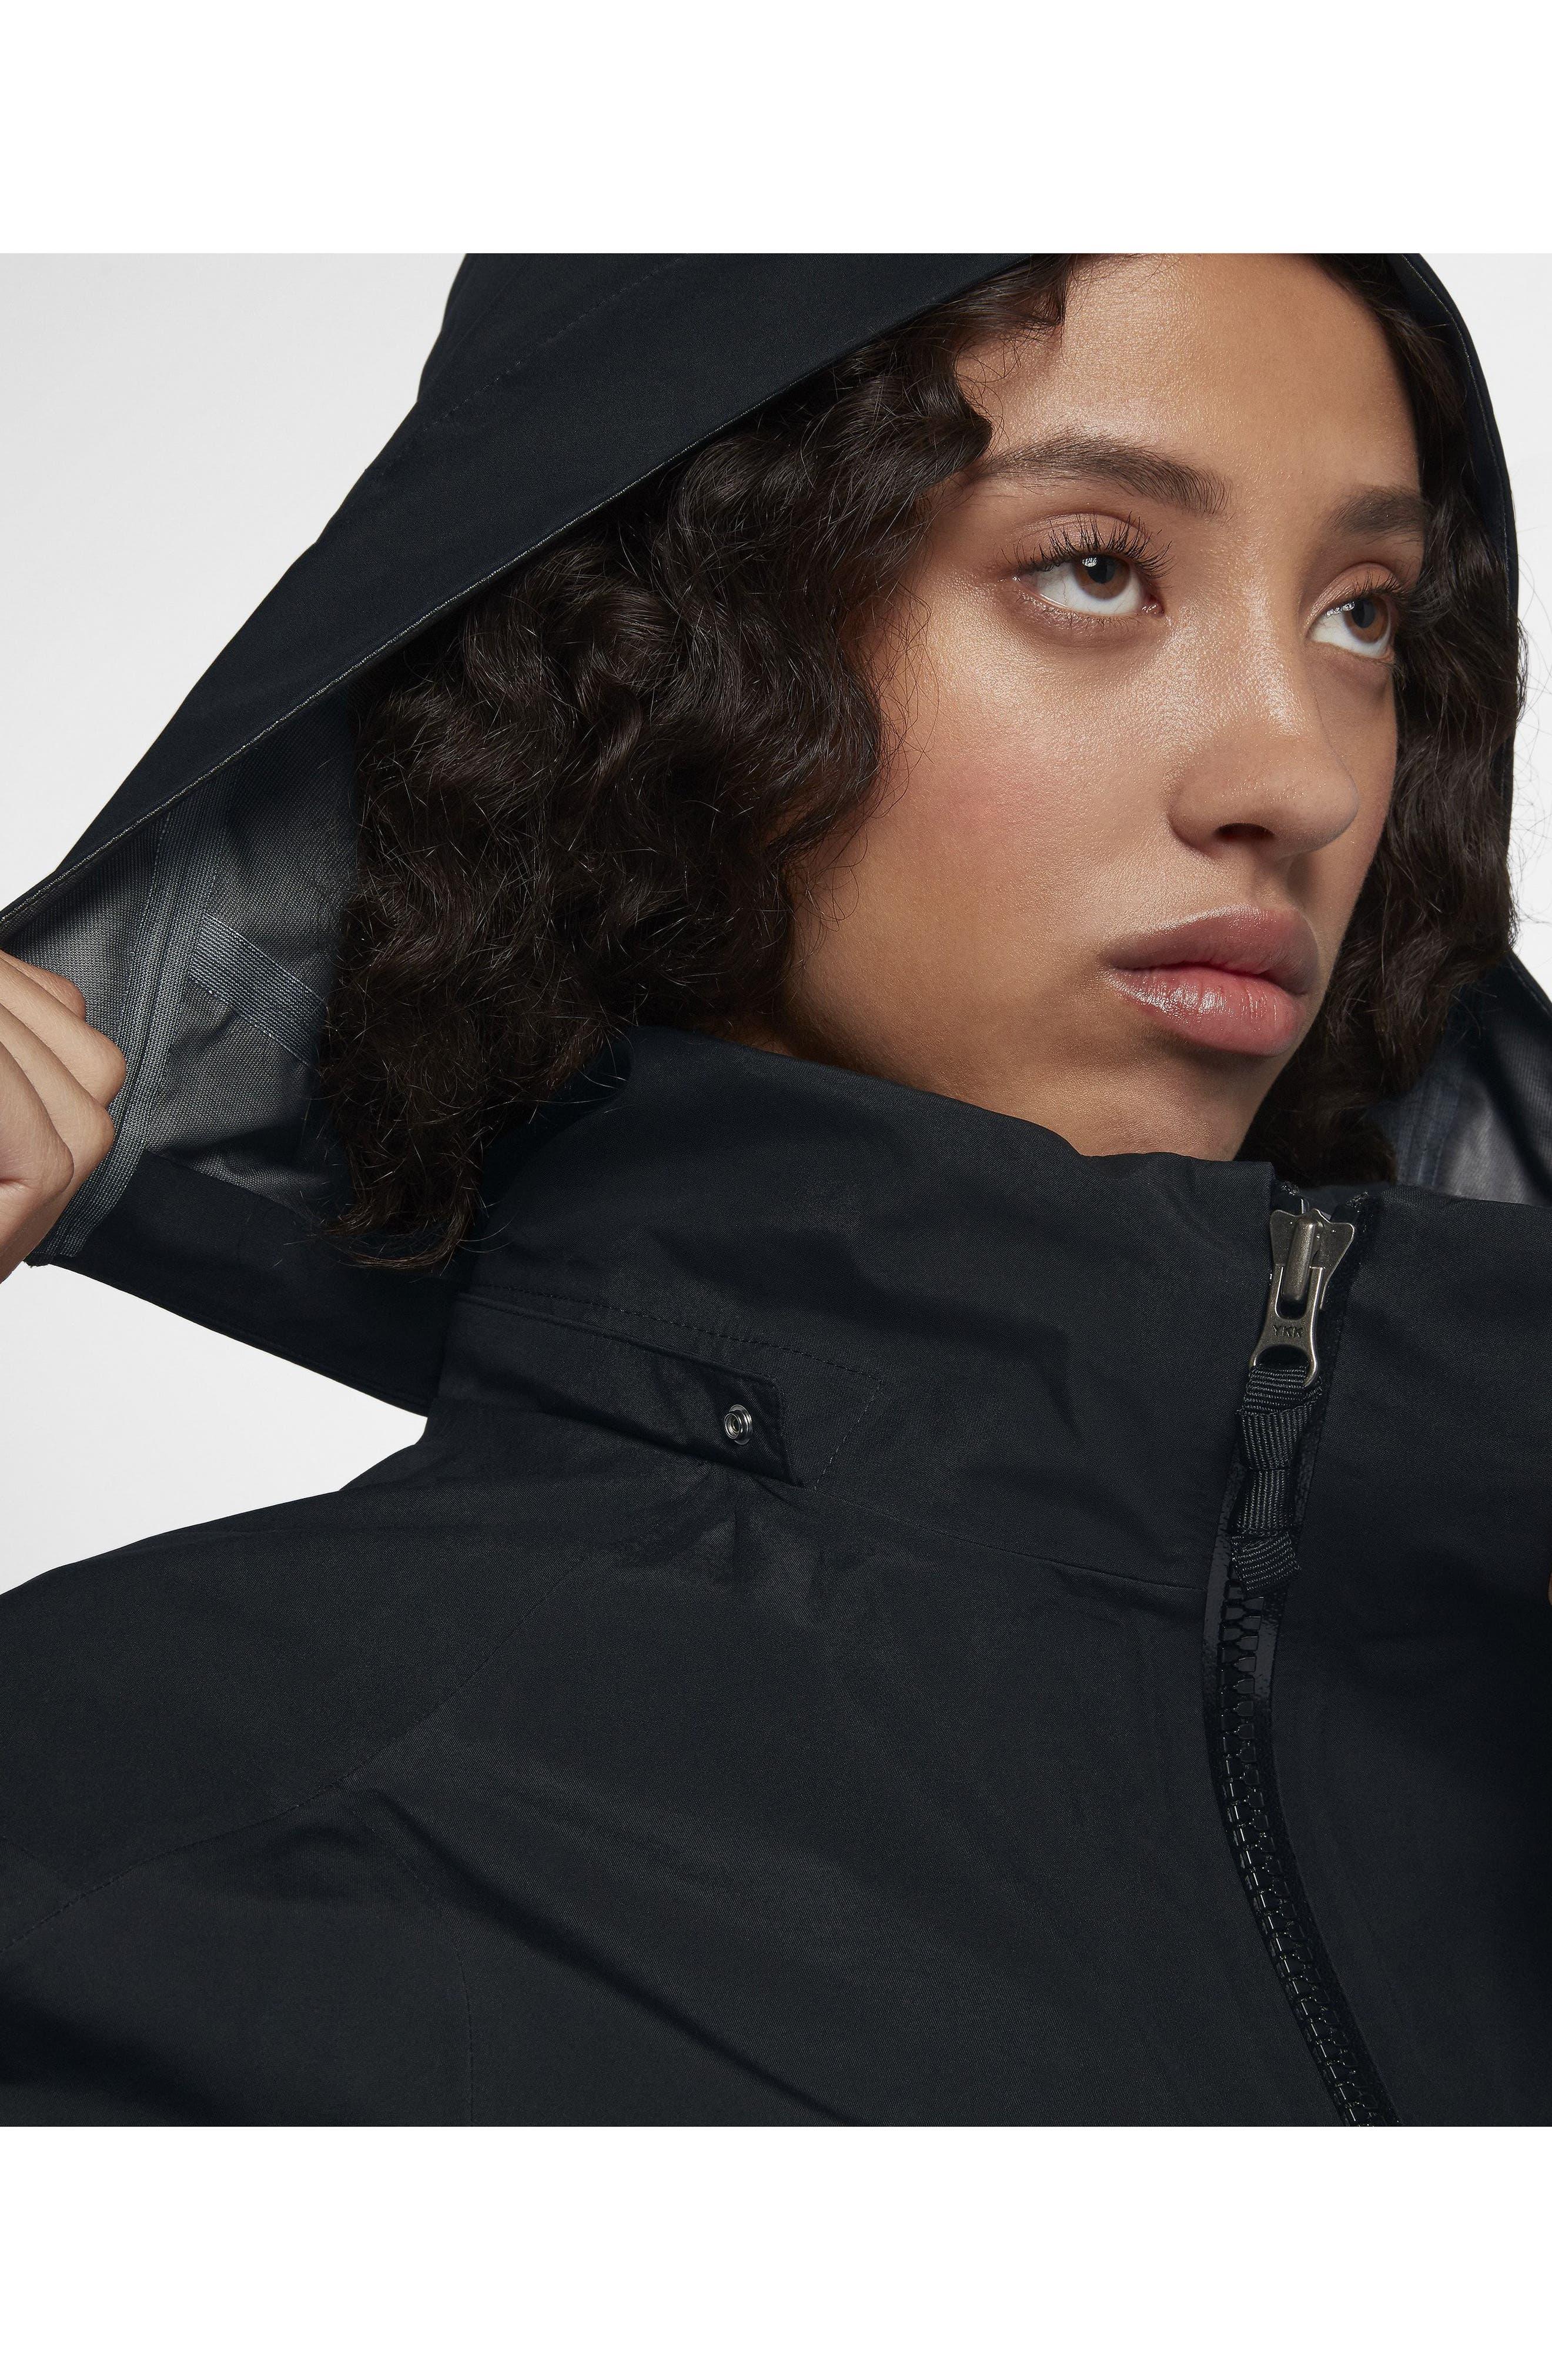 NikeLab ACG Gore-Tex<sup>®</sup> Women's Jacket,                             Alternate thumbnail 7, color,                             010